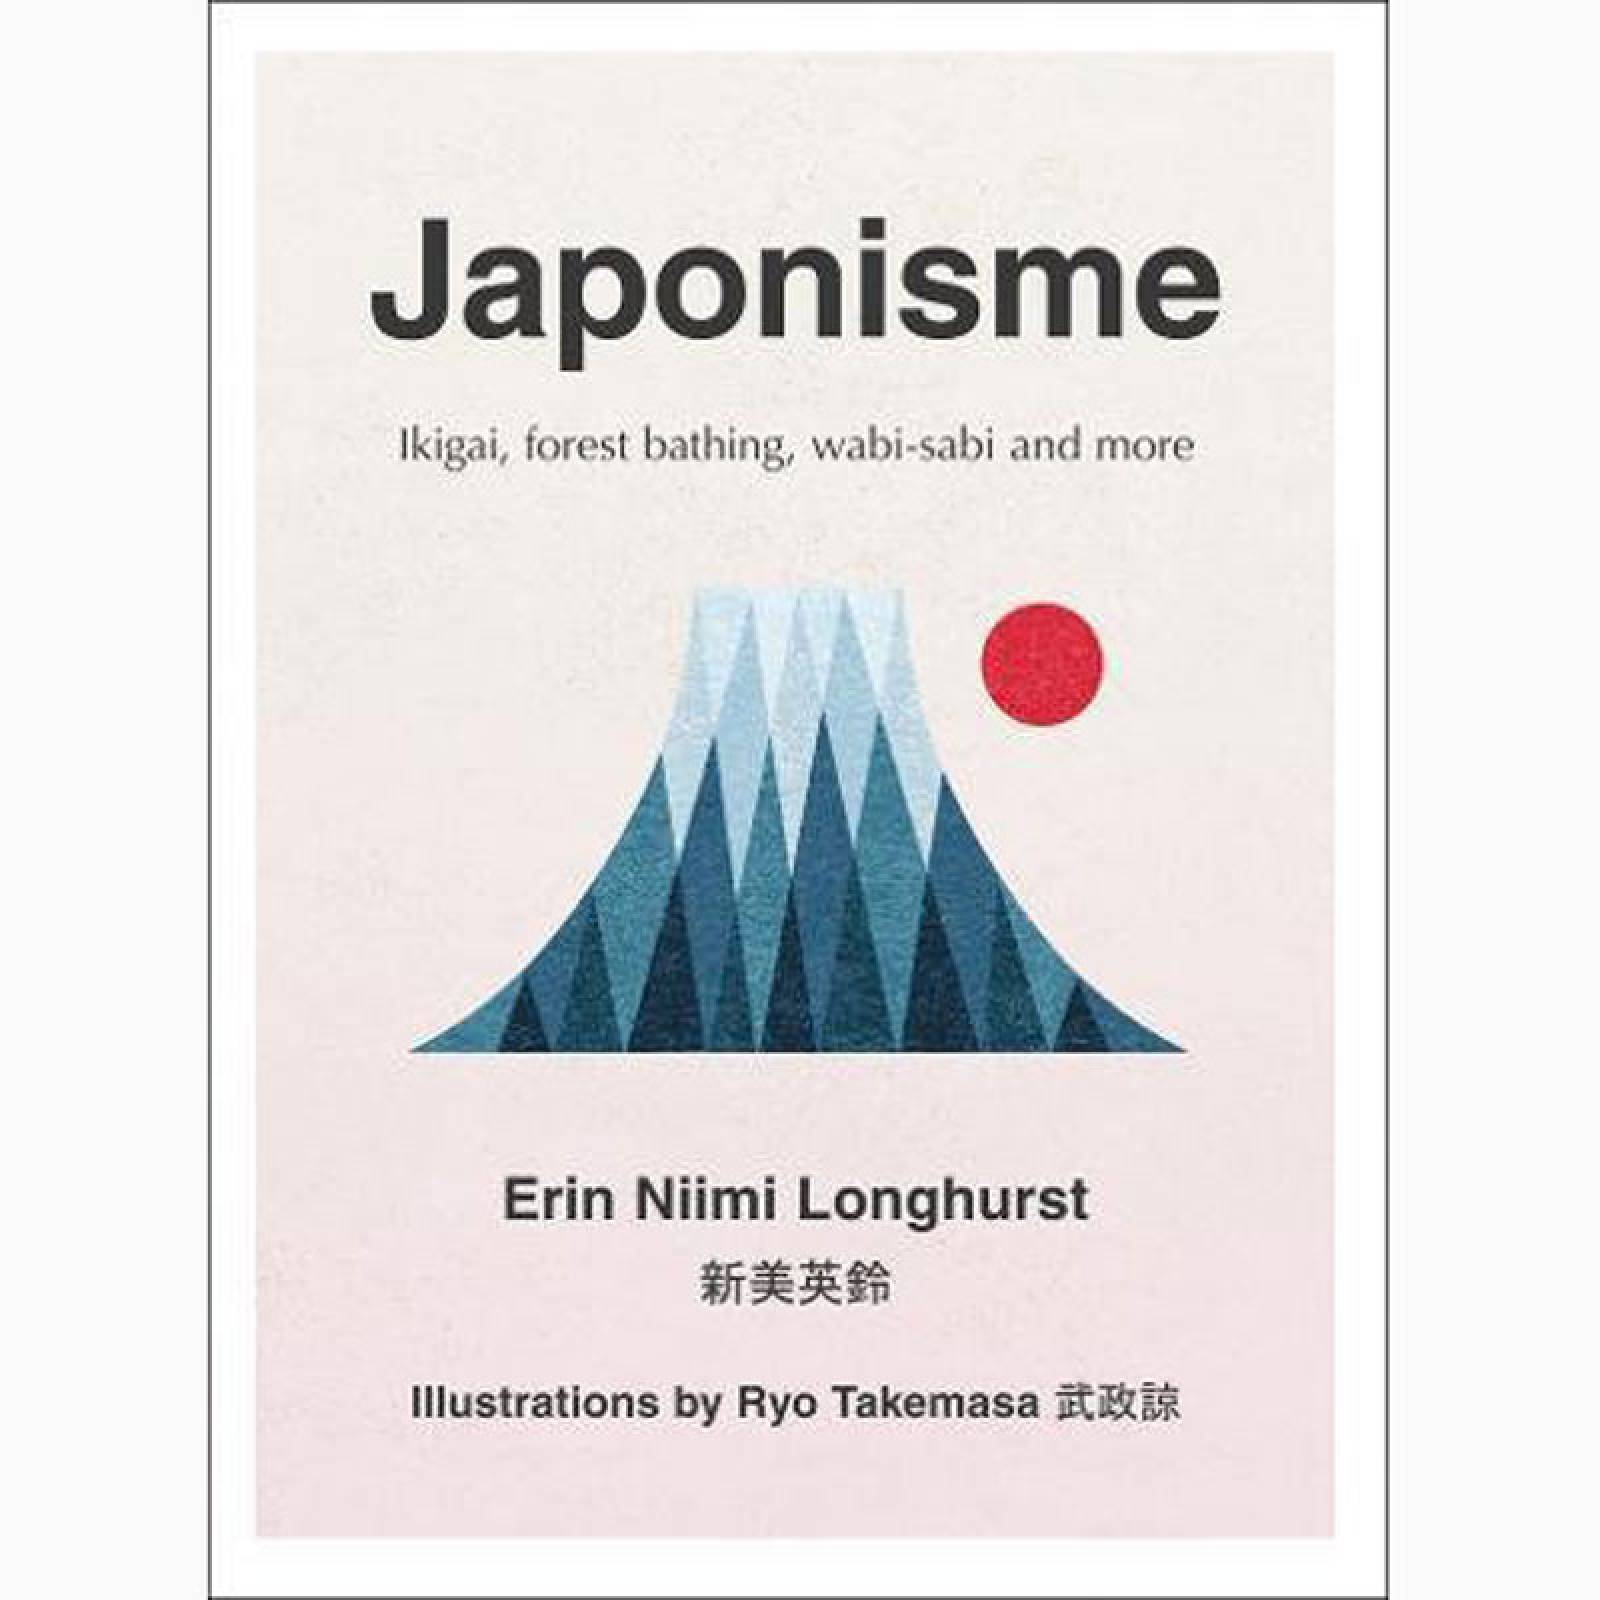 Japonisme: Ikigai Forest Bathing Wabi-sabi and more - Hardback